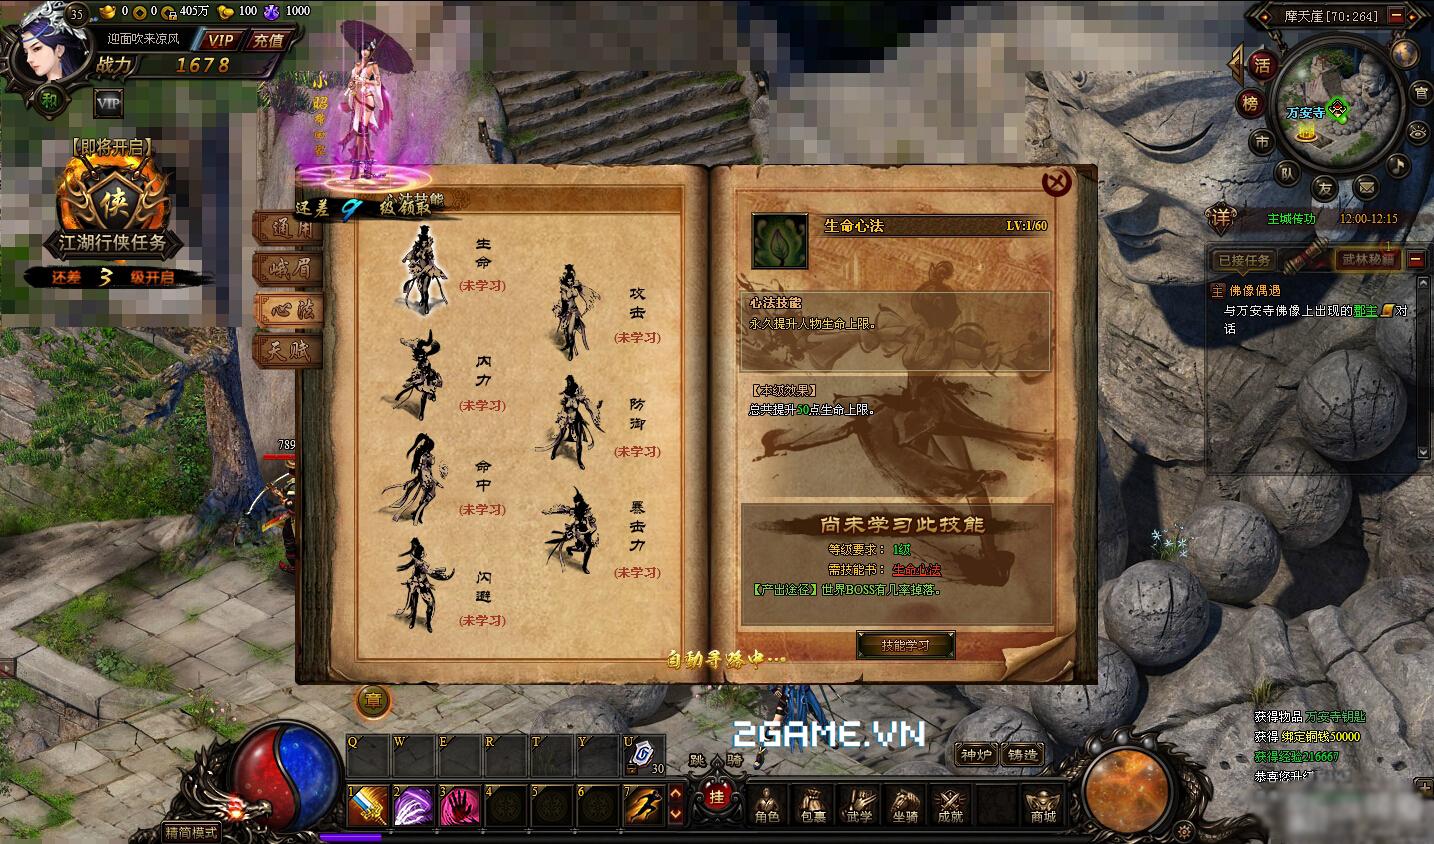 2game-cuu-am-chan-kinh-2d-web-10.jpg (1434×844)